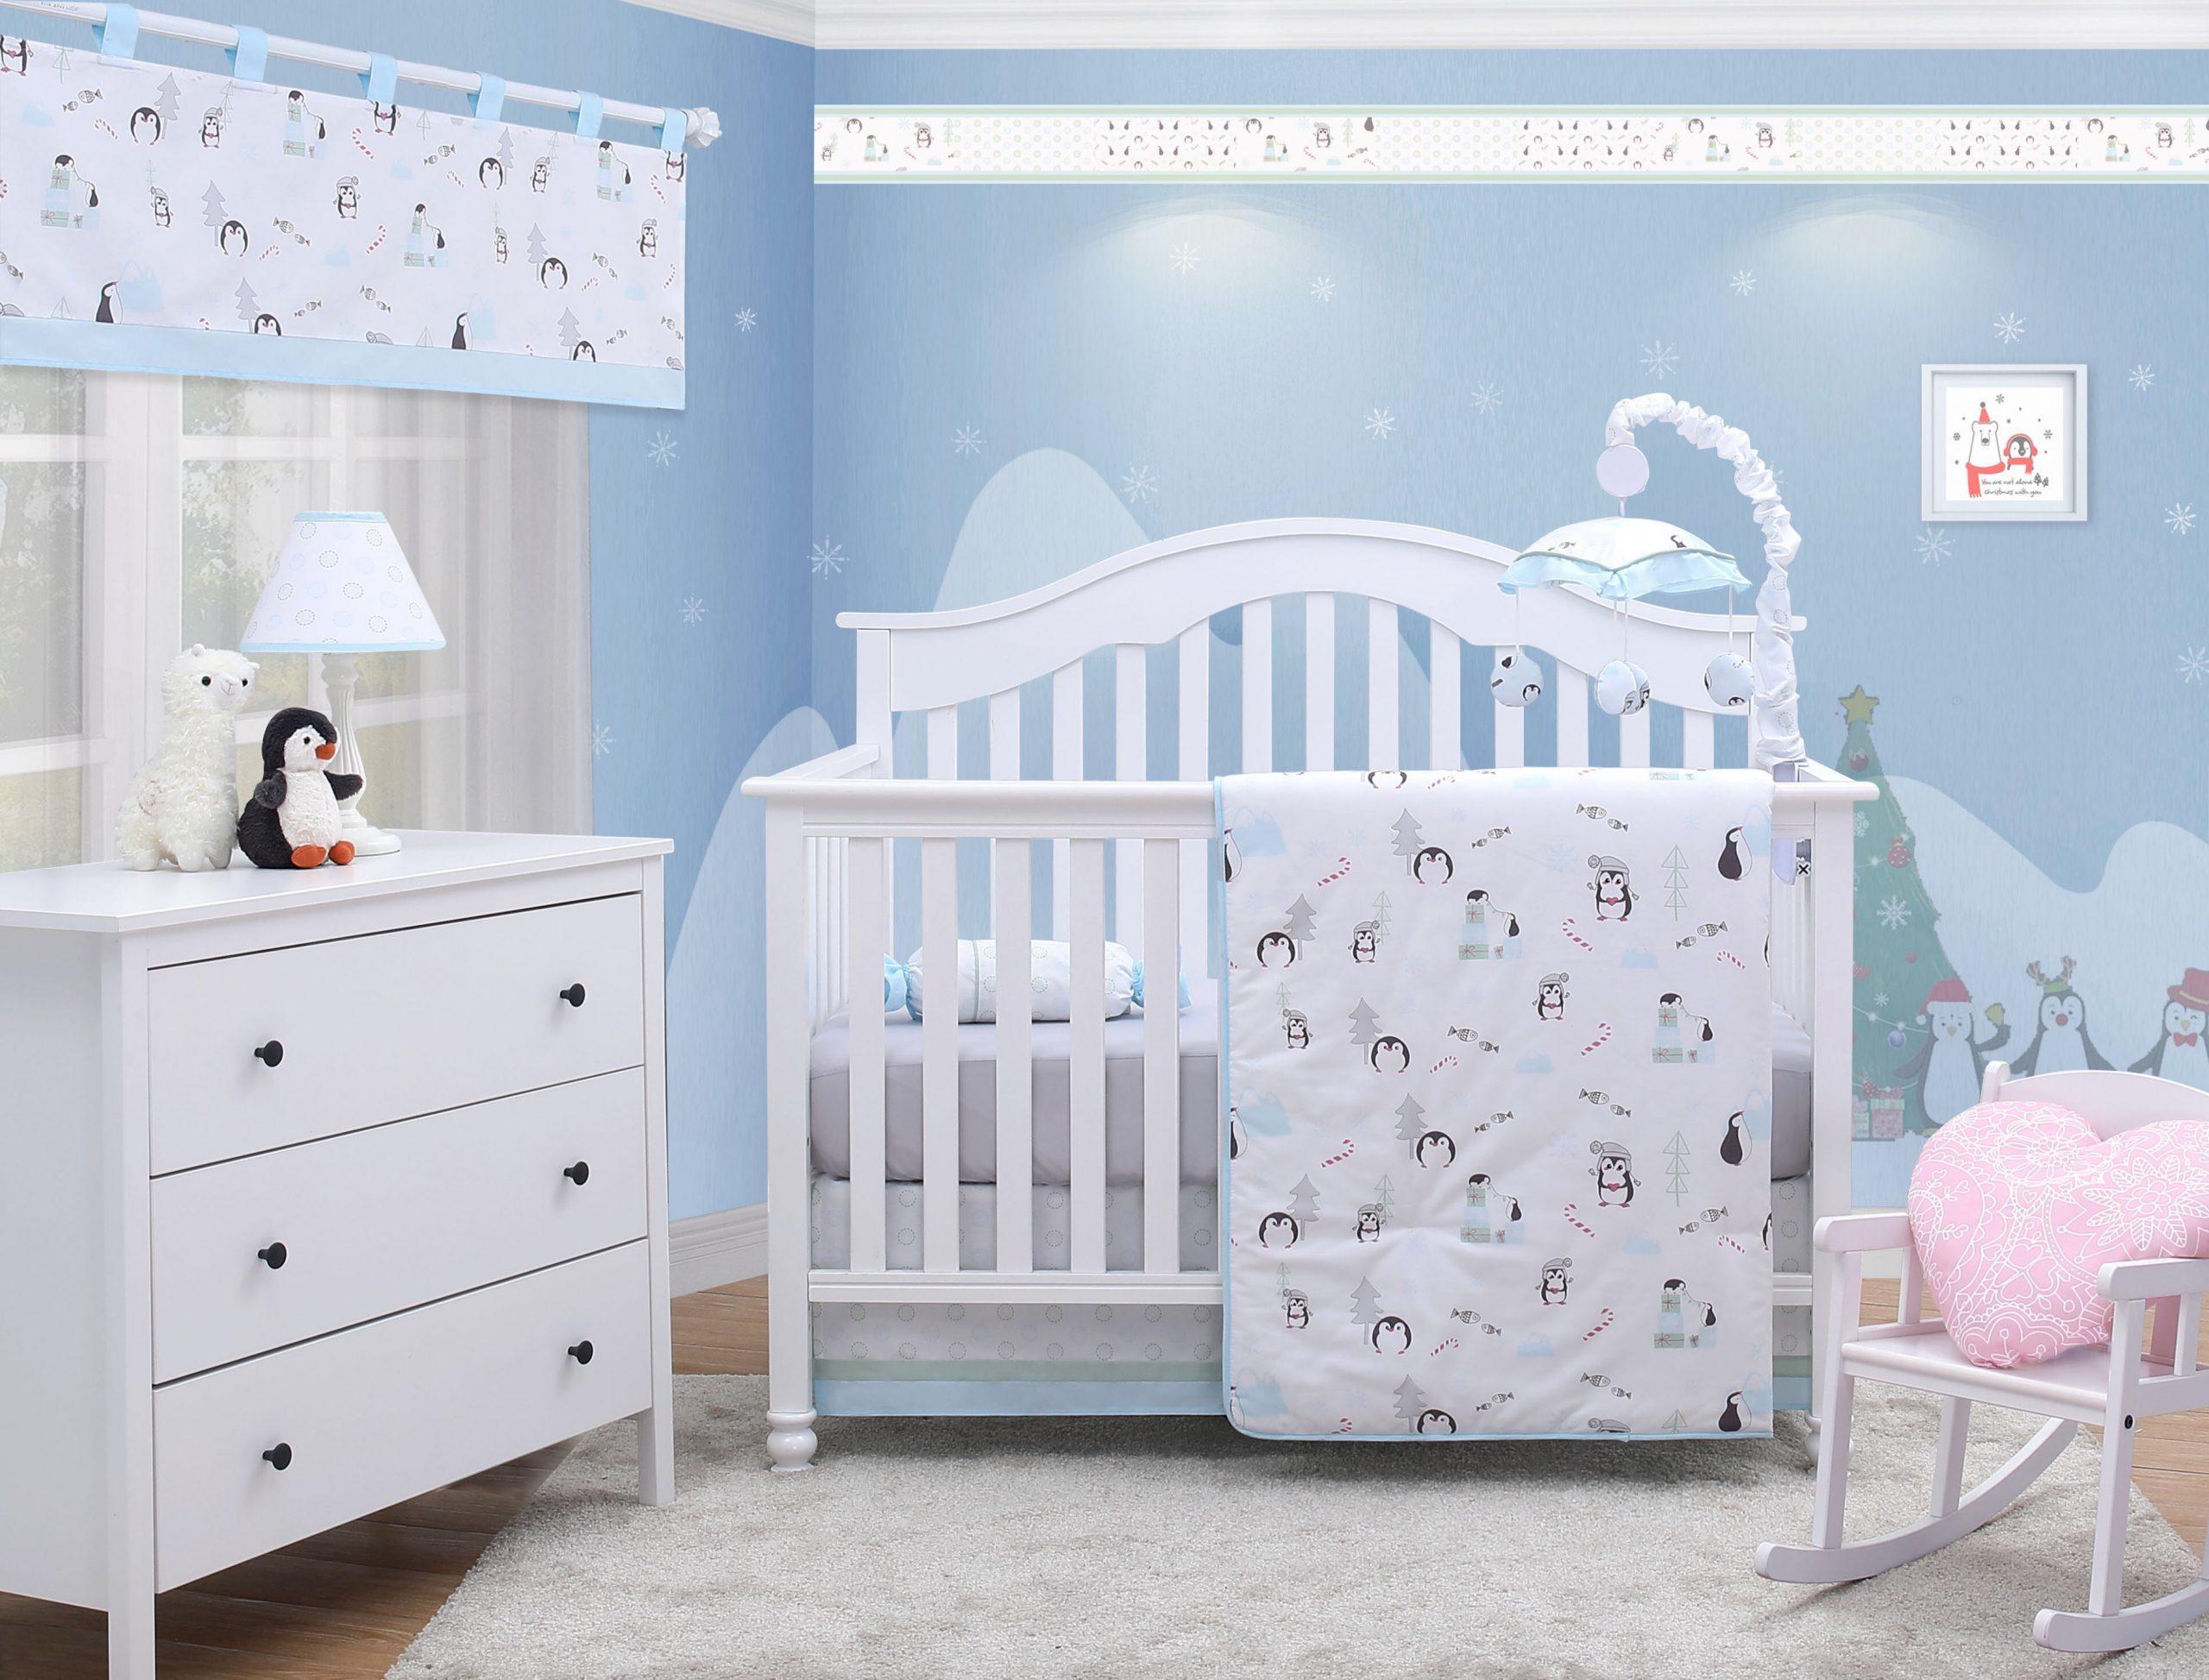 OptimaBaby - Baby Bedding  Walmart Canada - Baby Room Set